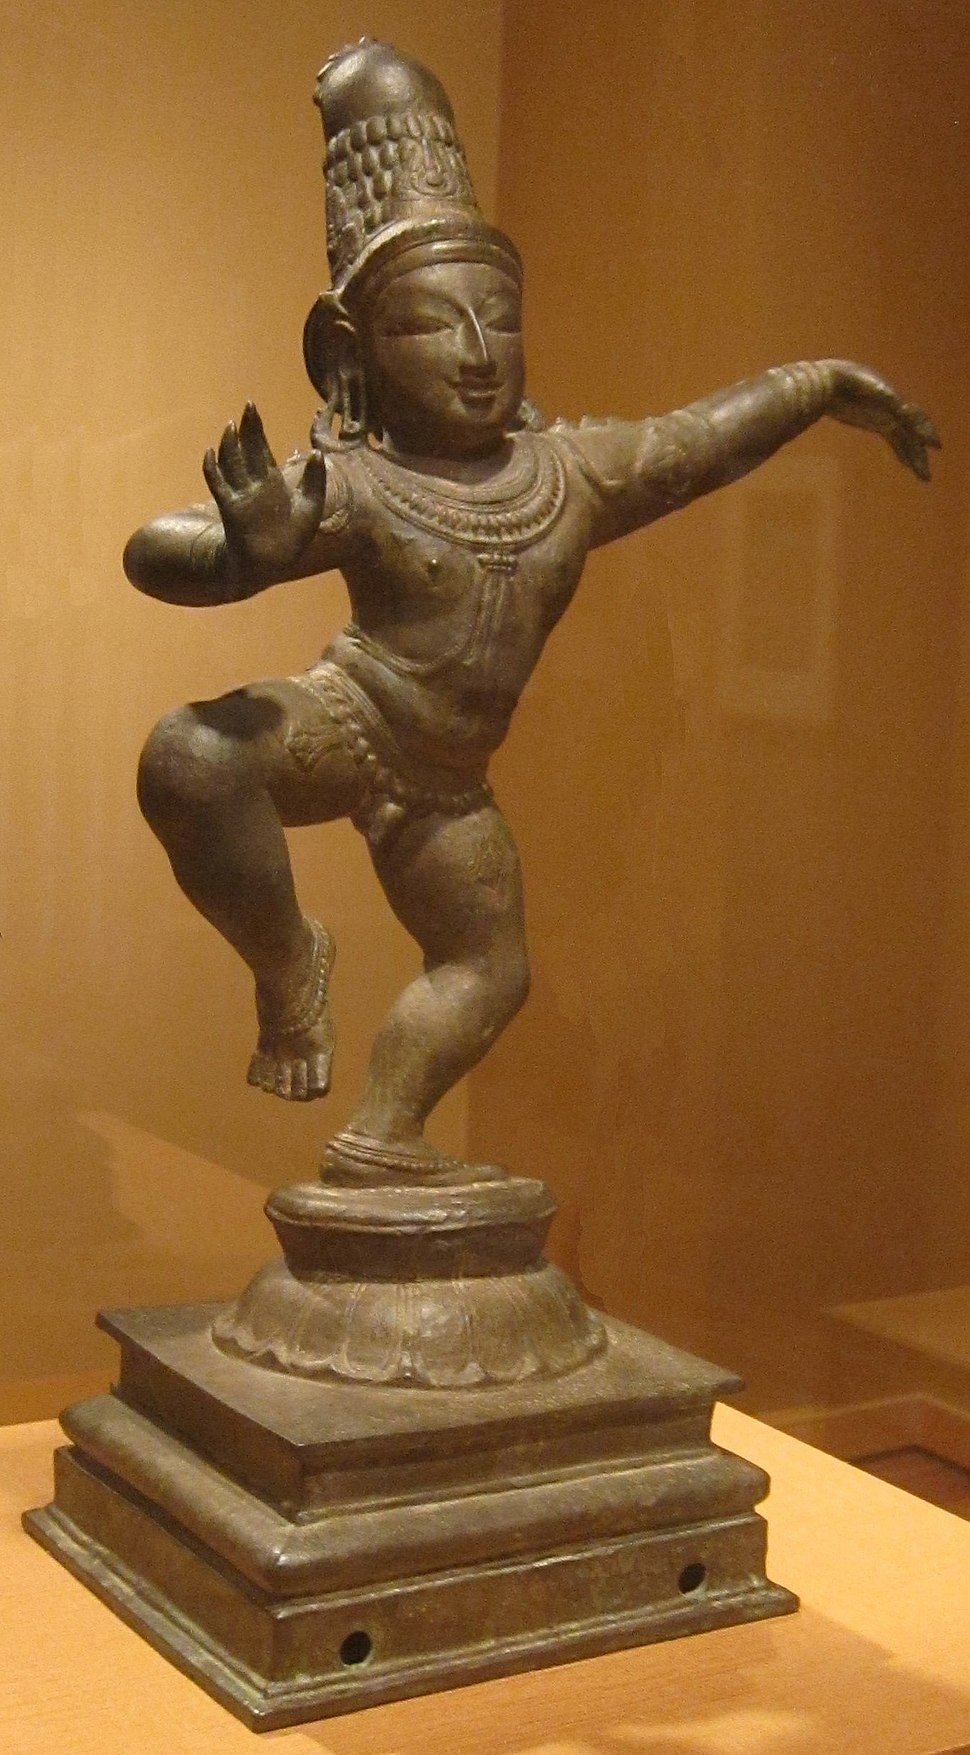 Dancing Krishna, India, Tanjore, Tamil Nadu, Chola dynasty, 14th century, bronze, HAA